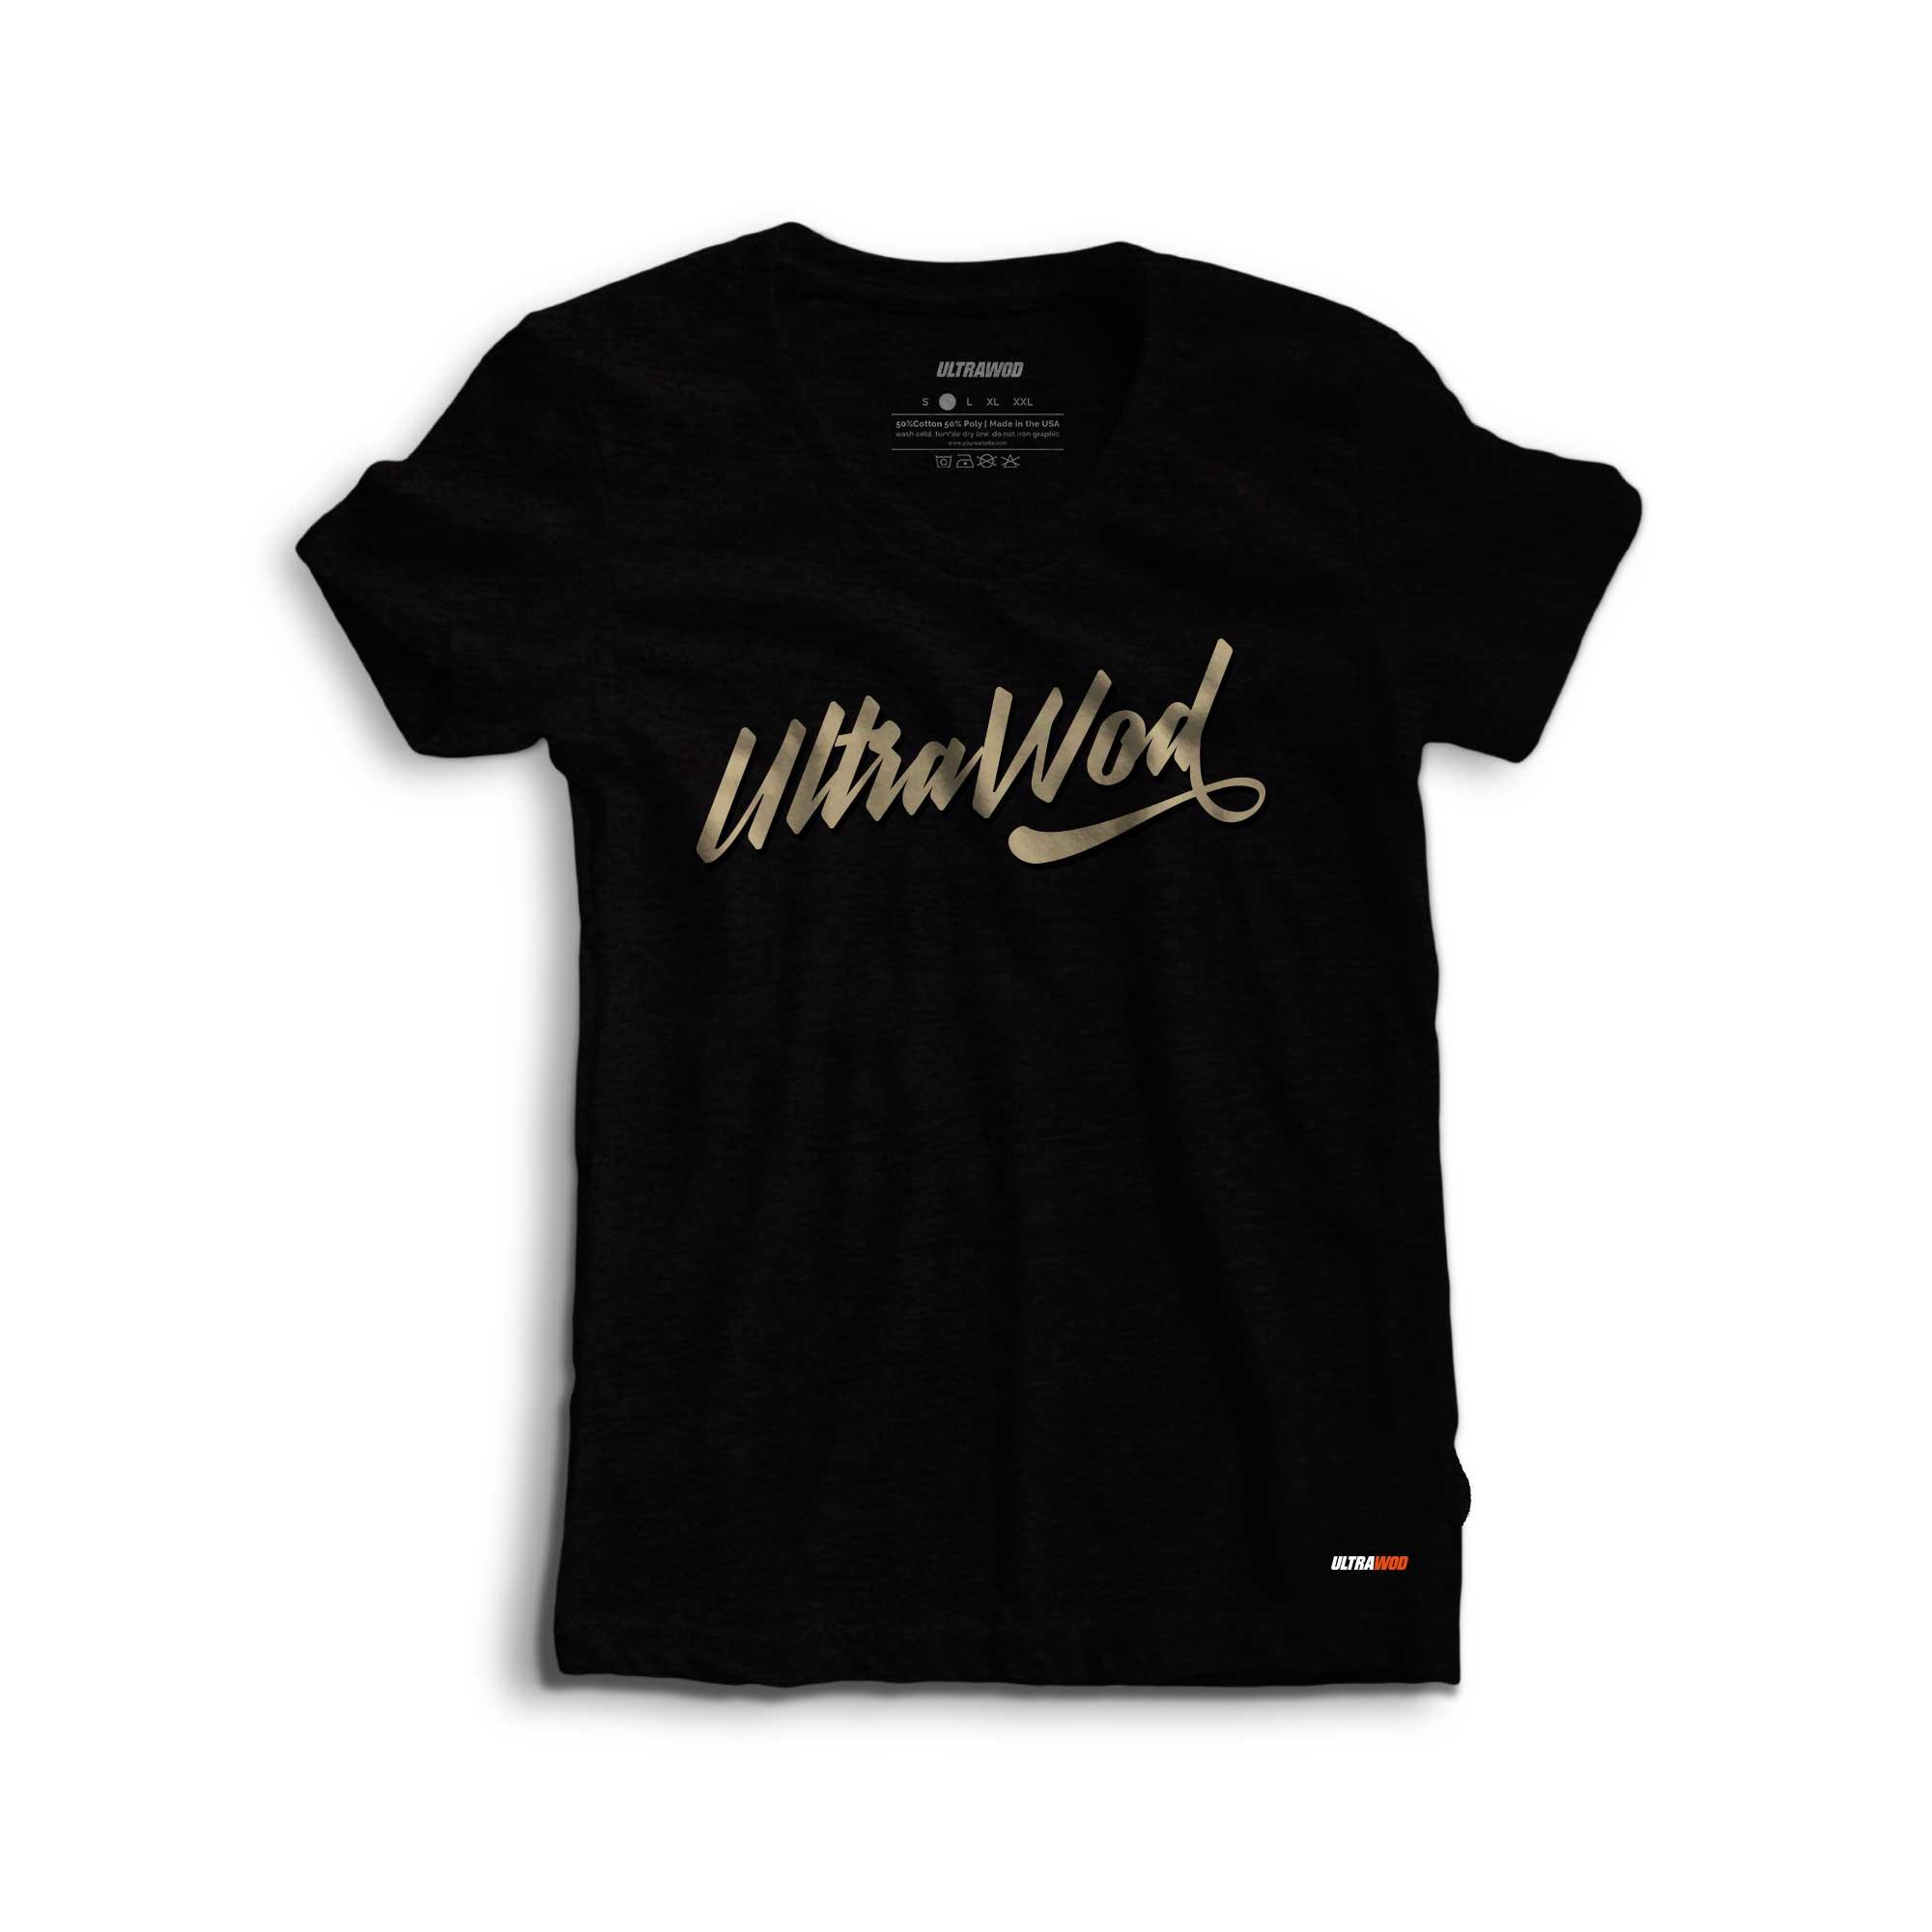 Camiseta Feminina Vintage UltraWod